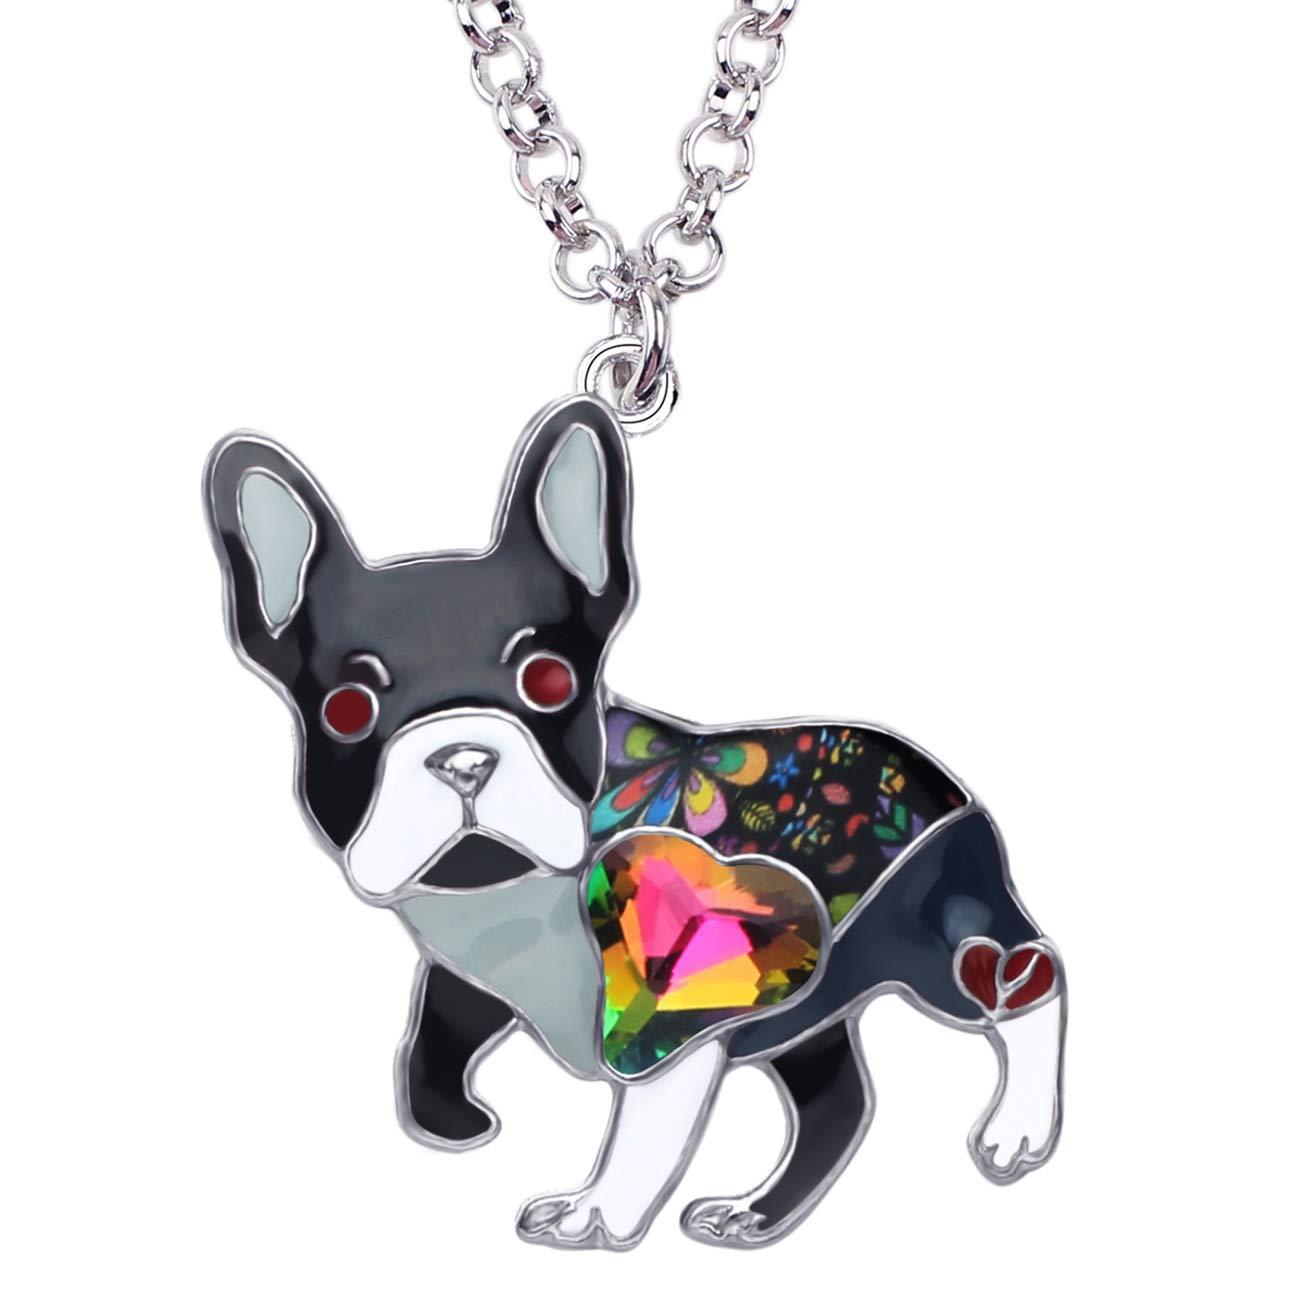 BONSNY Statement Enamel Rhinestone French Bulldog Necklaces Pendant Original Design for Women Kids Jewelry